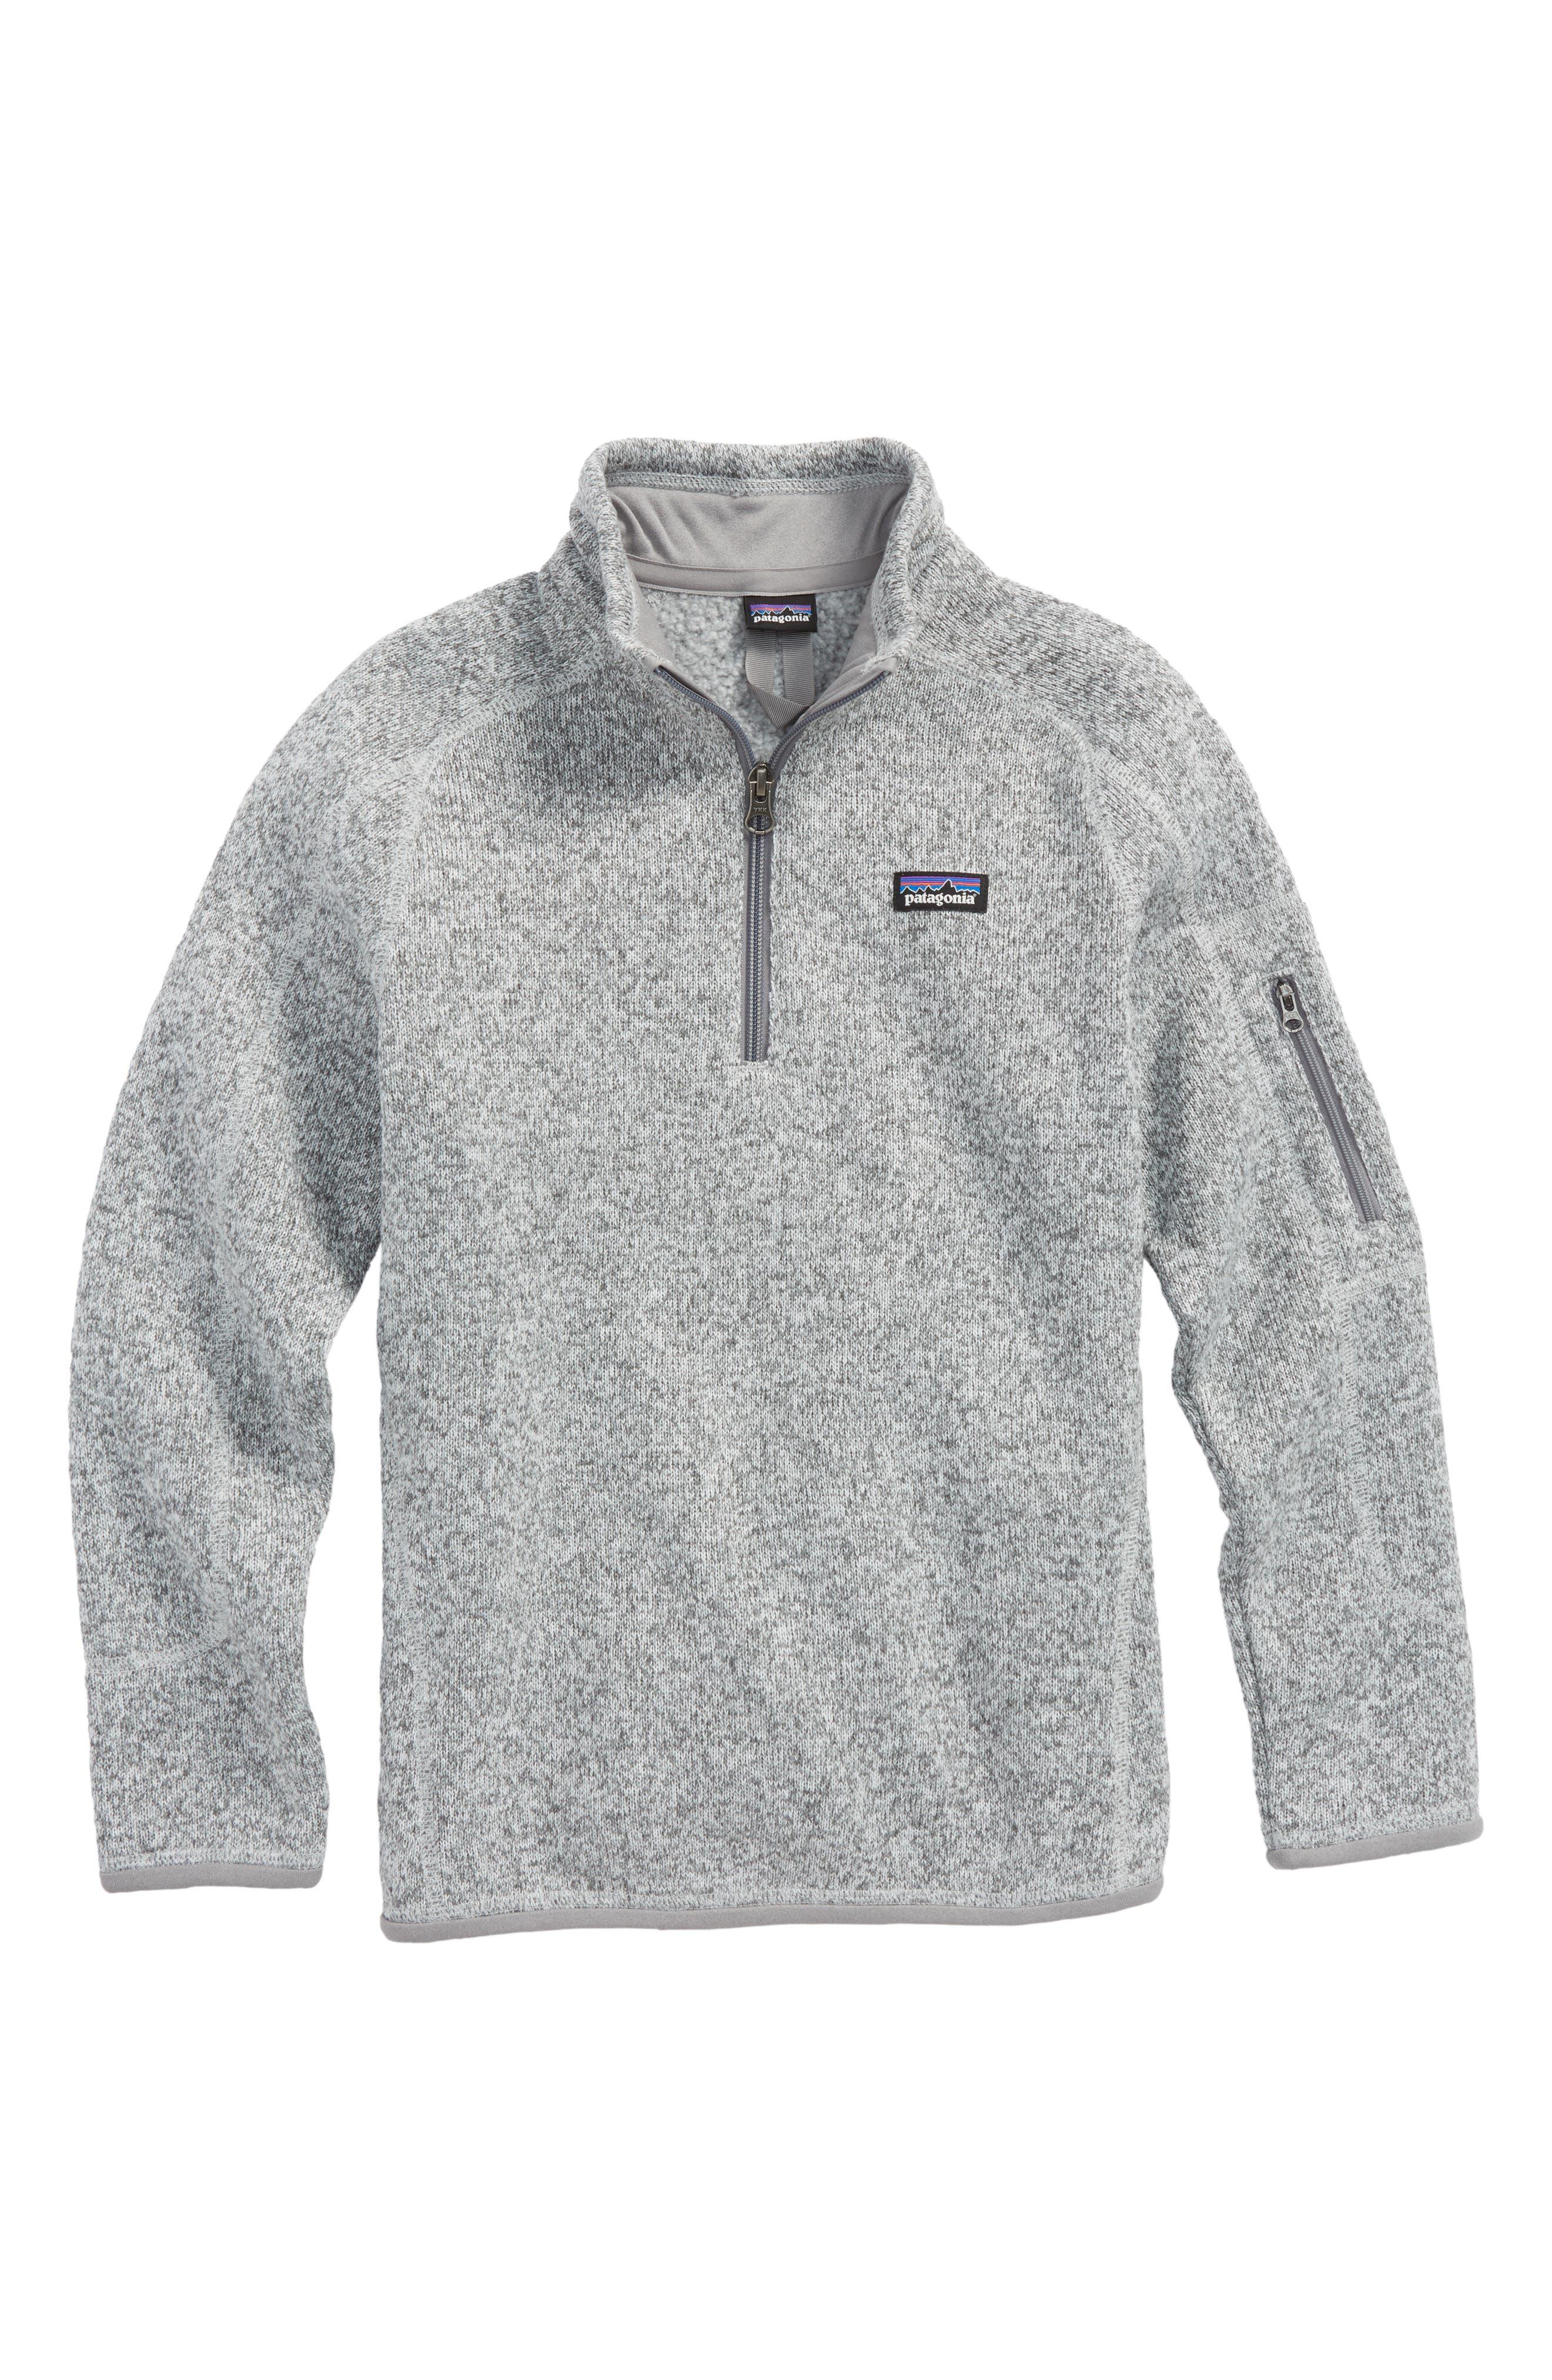 Better Sweater Quarter Zip Pullover,                             Main thumbnail 1, color,                             Birch White